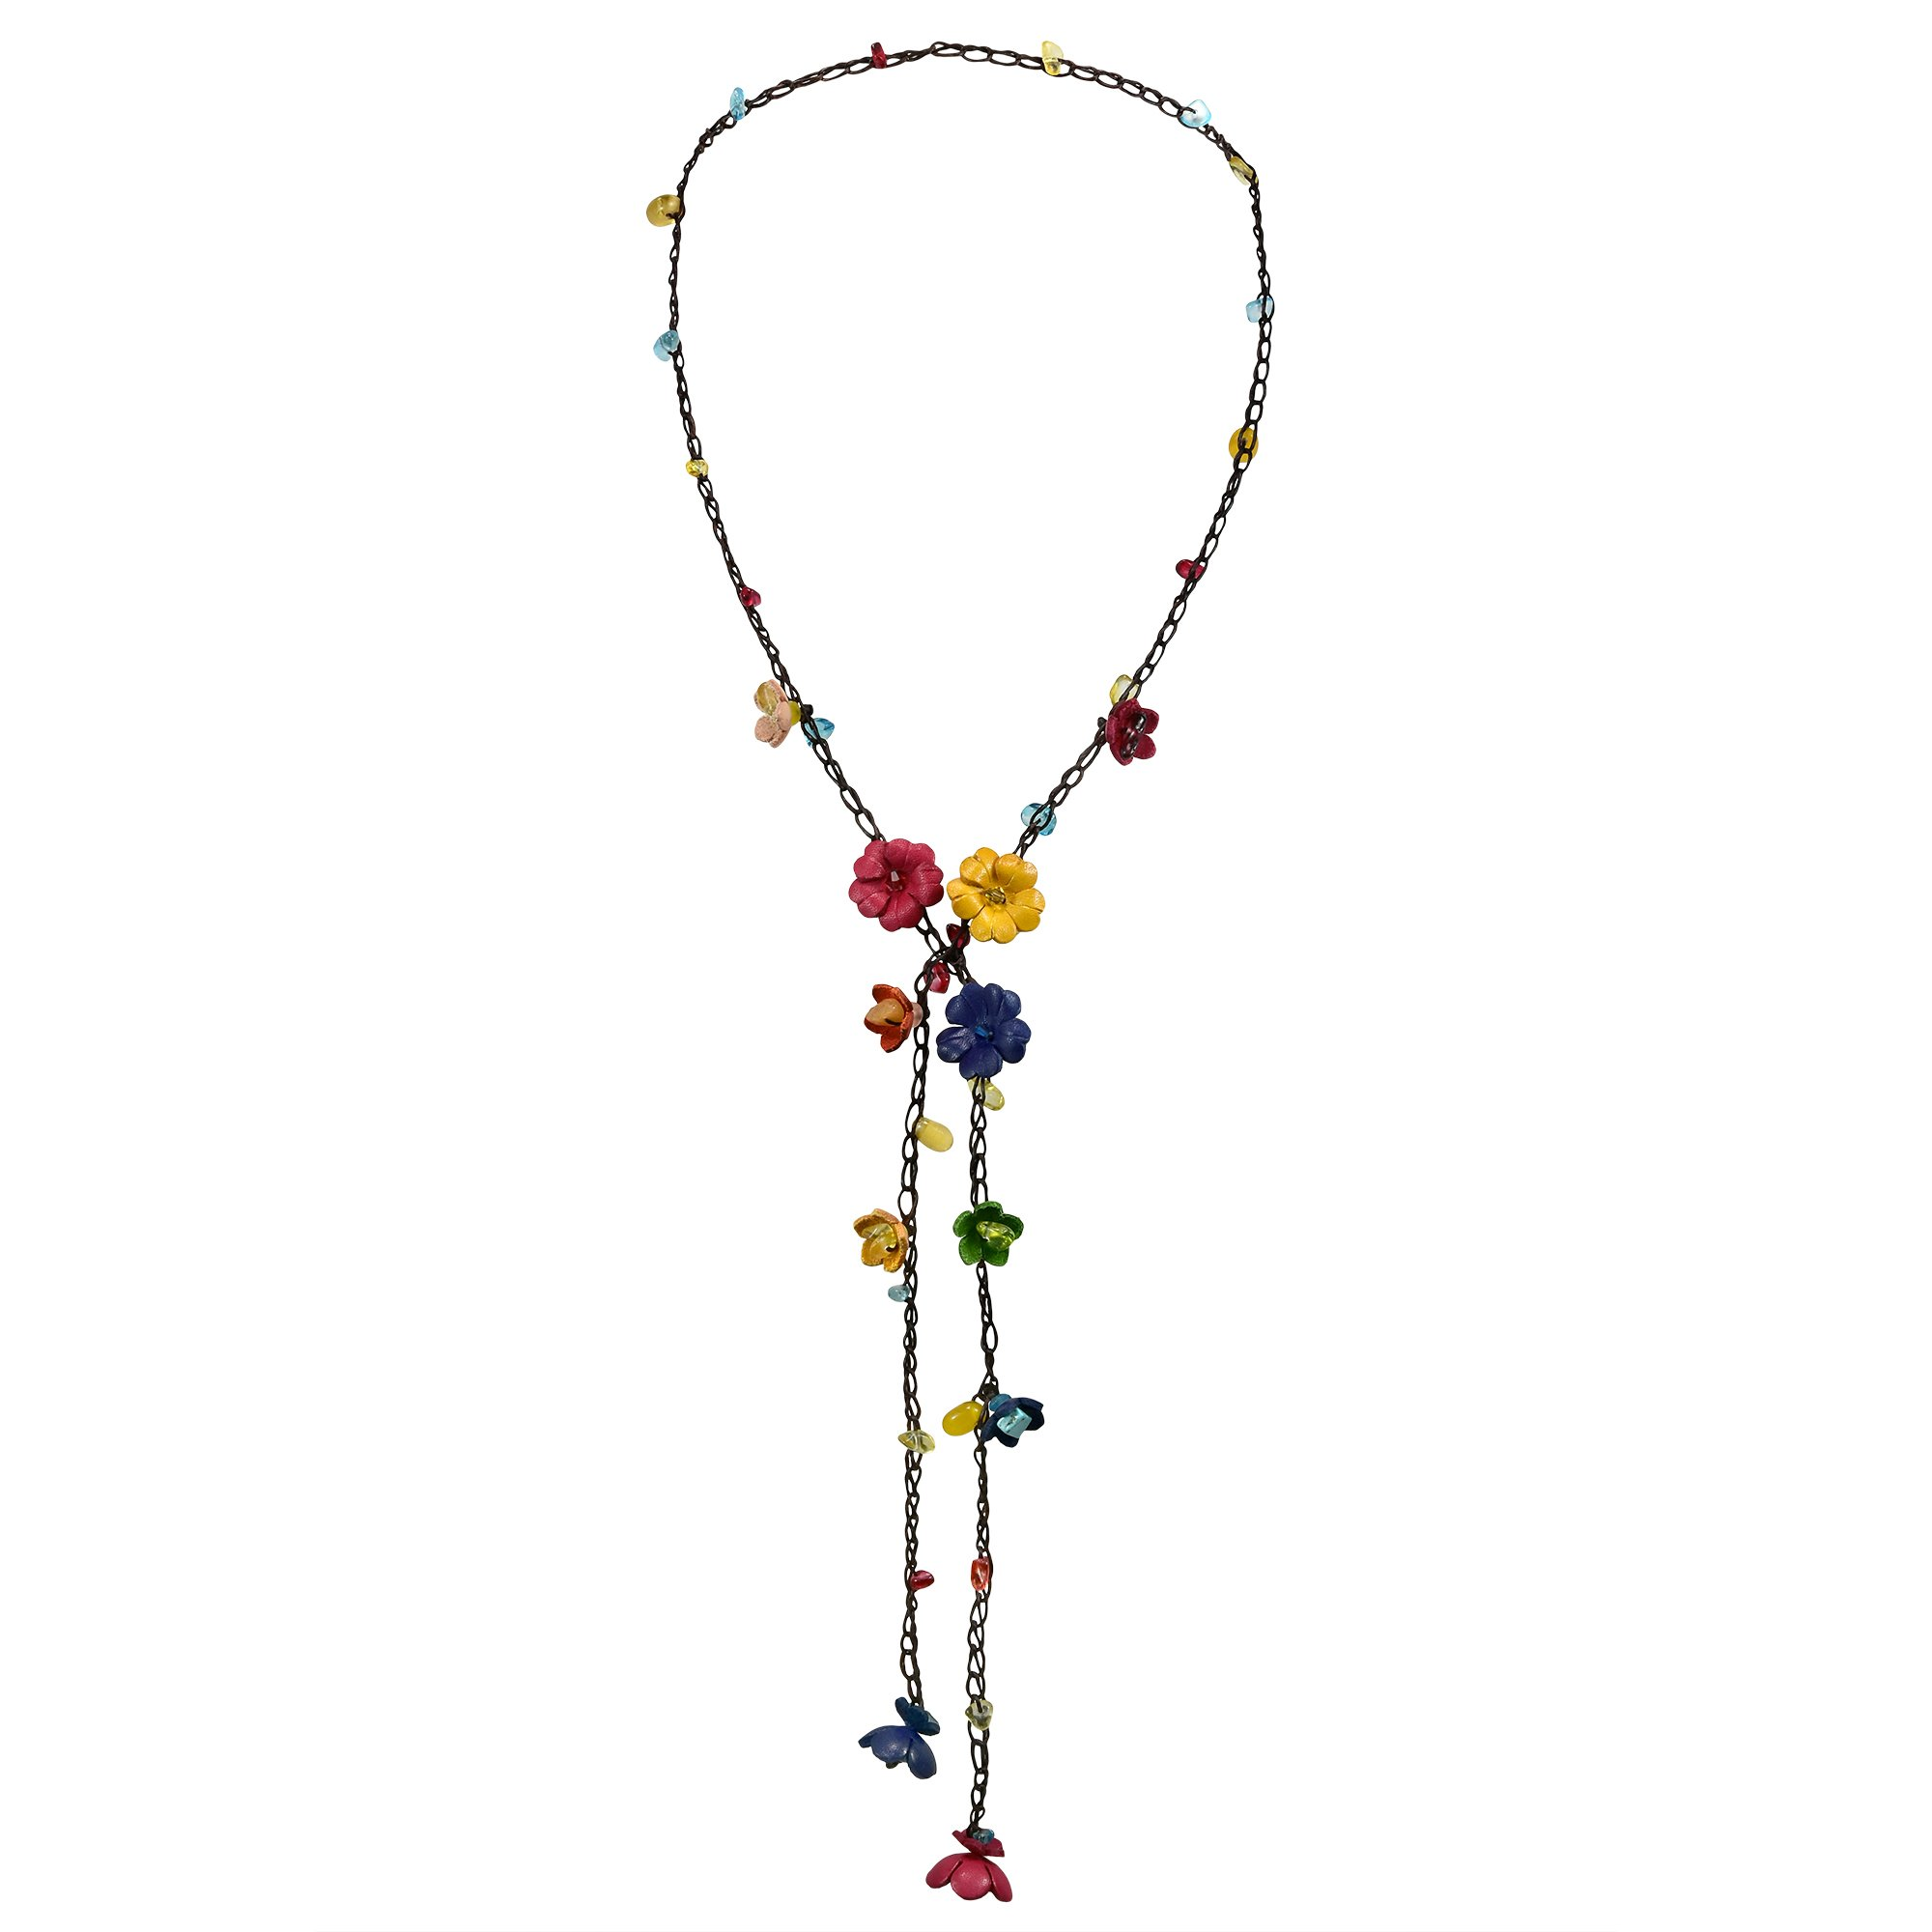 AeraVida Chic Multicolor Daisy Floral Mix Stone Genuine Leather Lariat Wrap Necklace